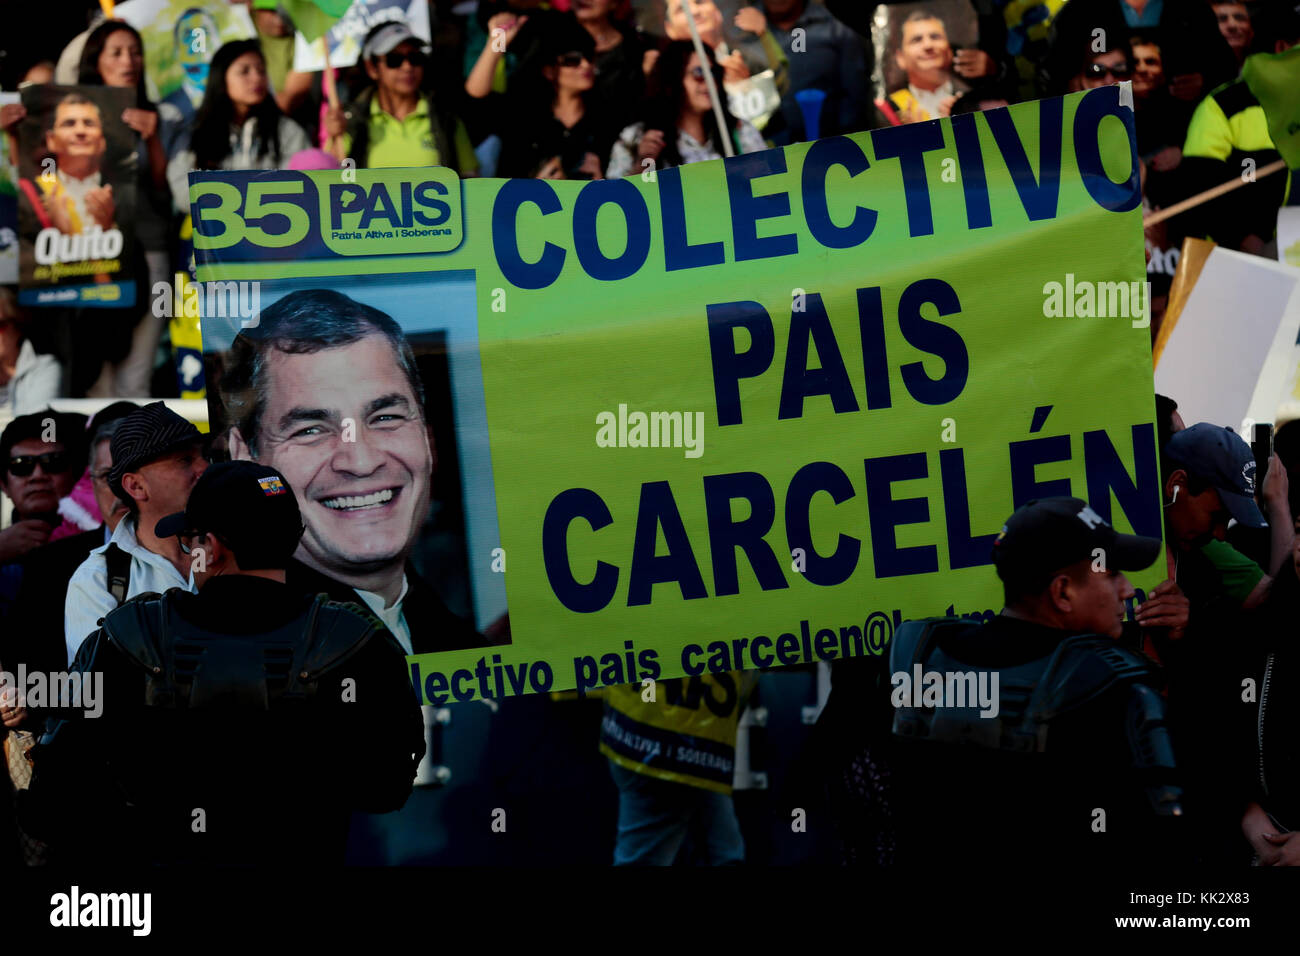 Quito, Ecuador. 28th Nov, 2017. Sympathizers show support for former Ecuadoran President Rafael Correa during an - Stock Image